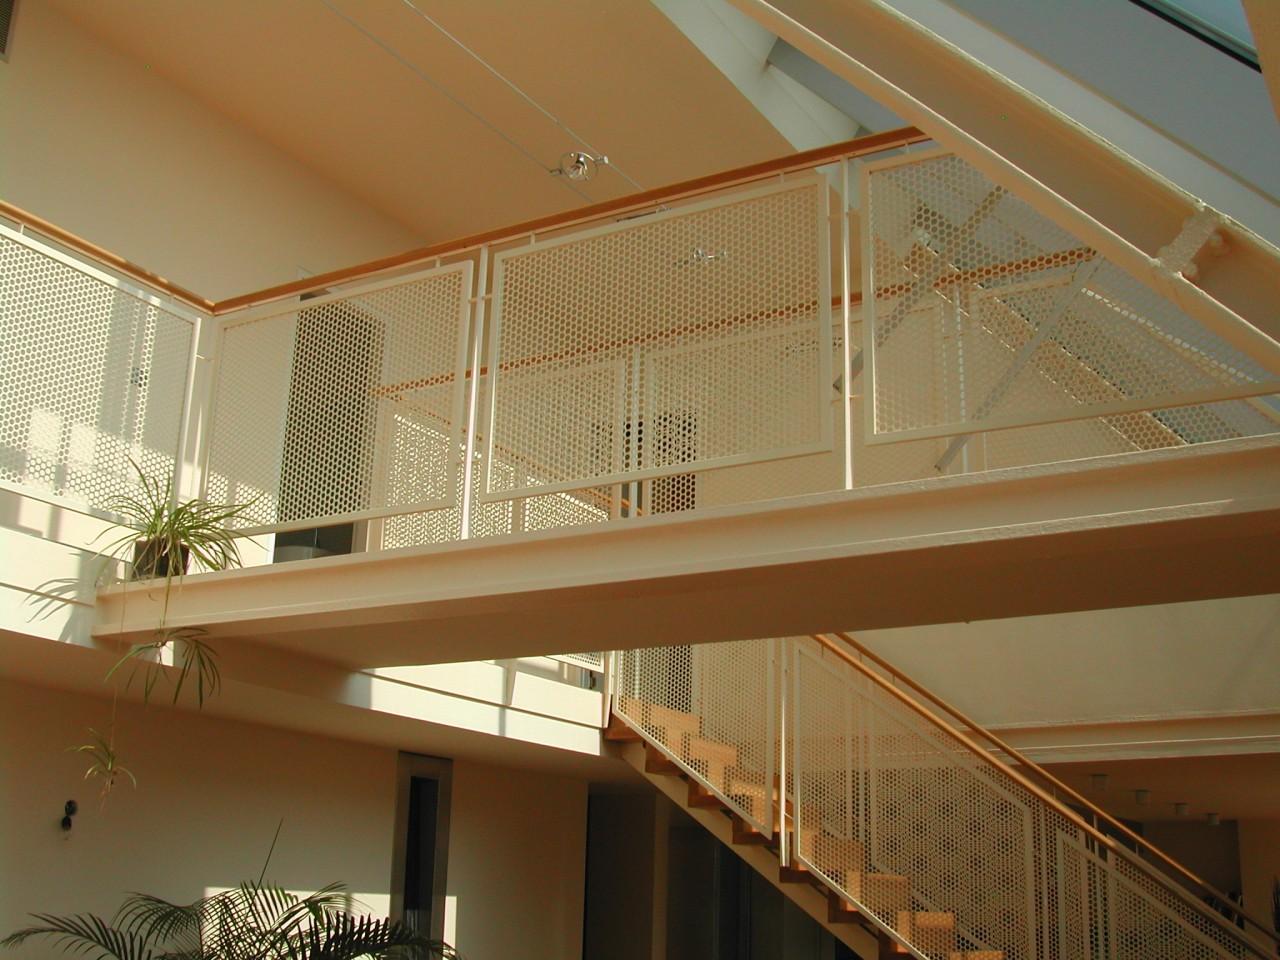 liegler takeh architekten projekt whs59 32 liegler takeh architekten. Black Bedroom Furniture Sets. Home Design Ideas